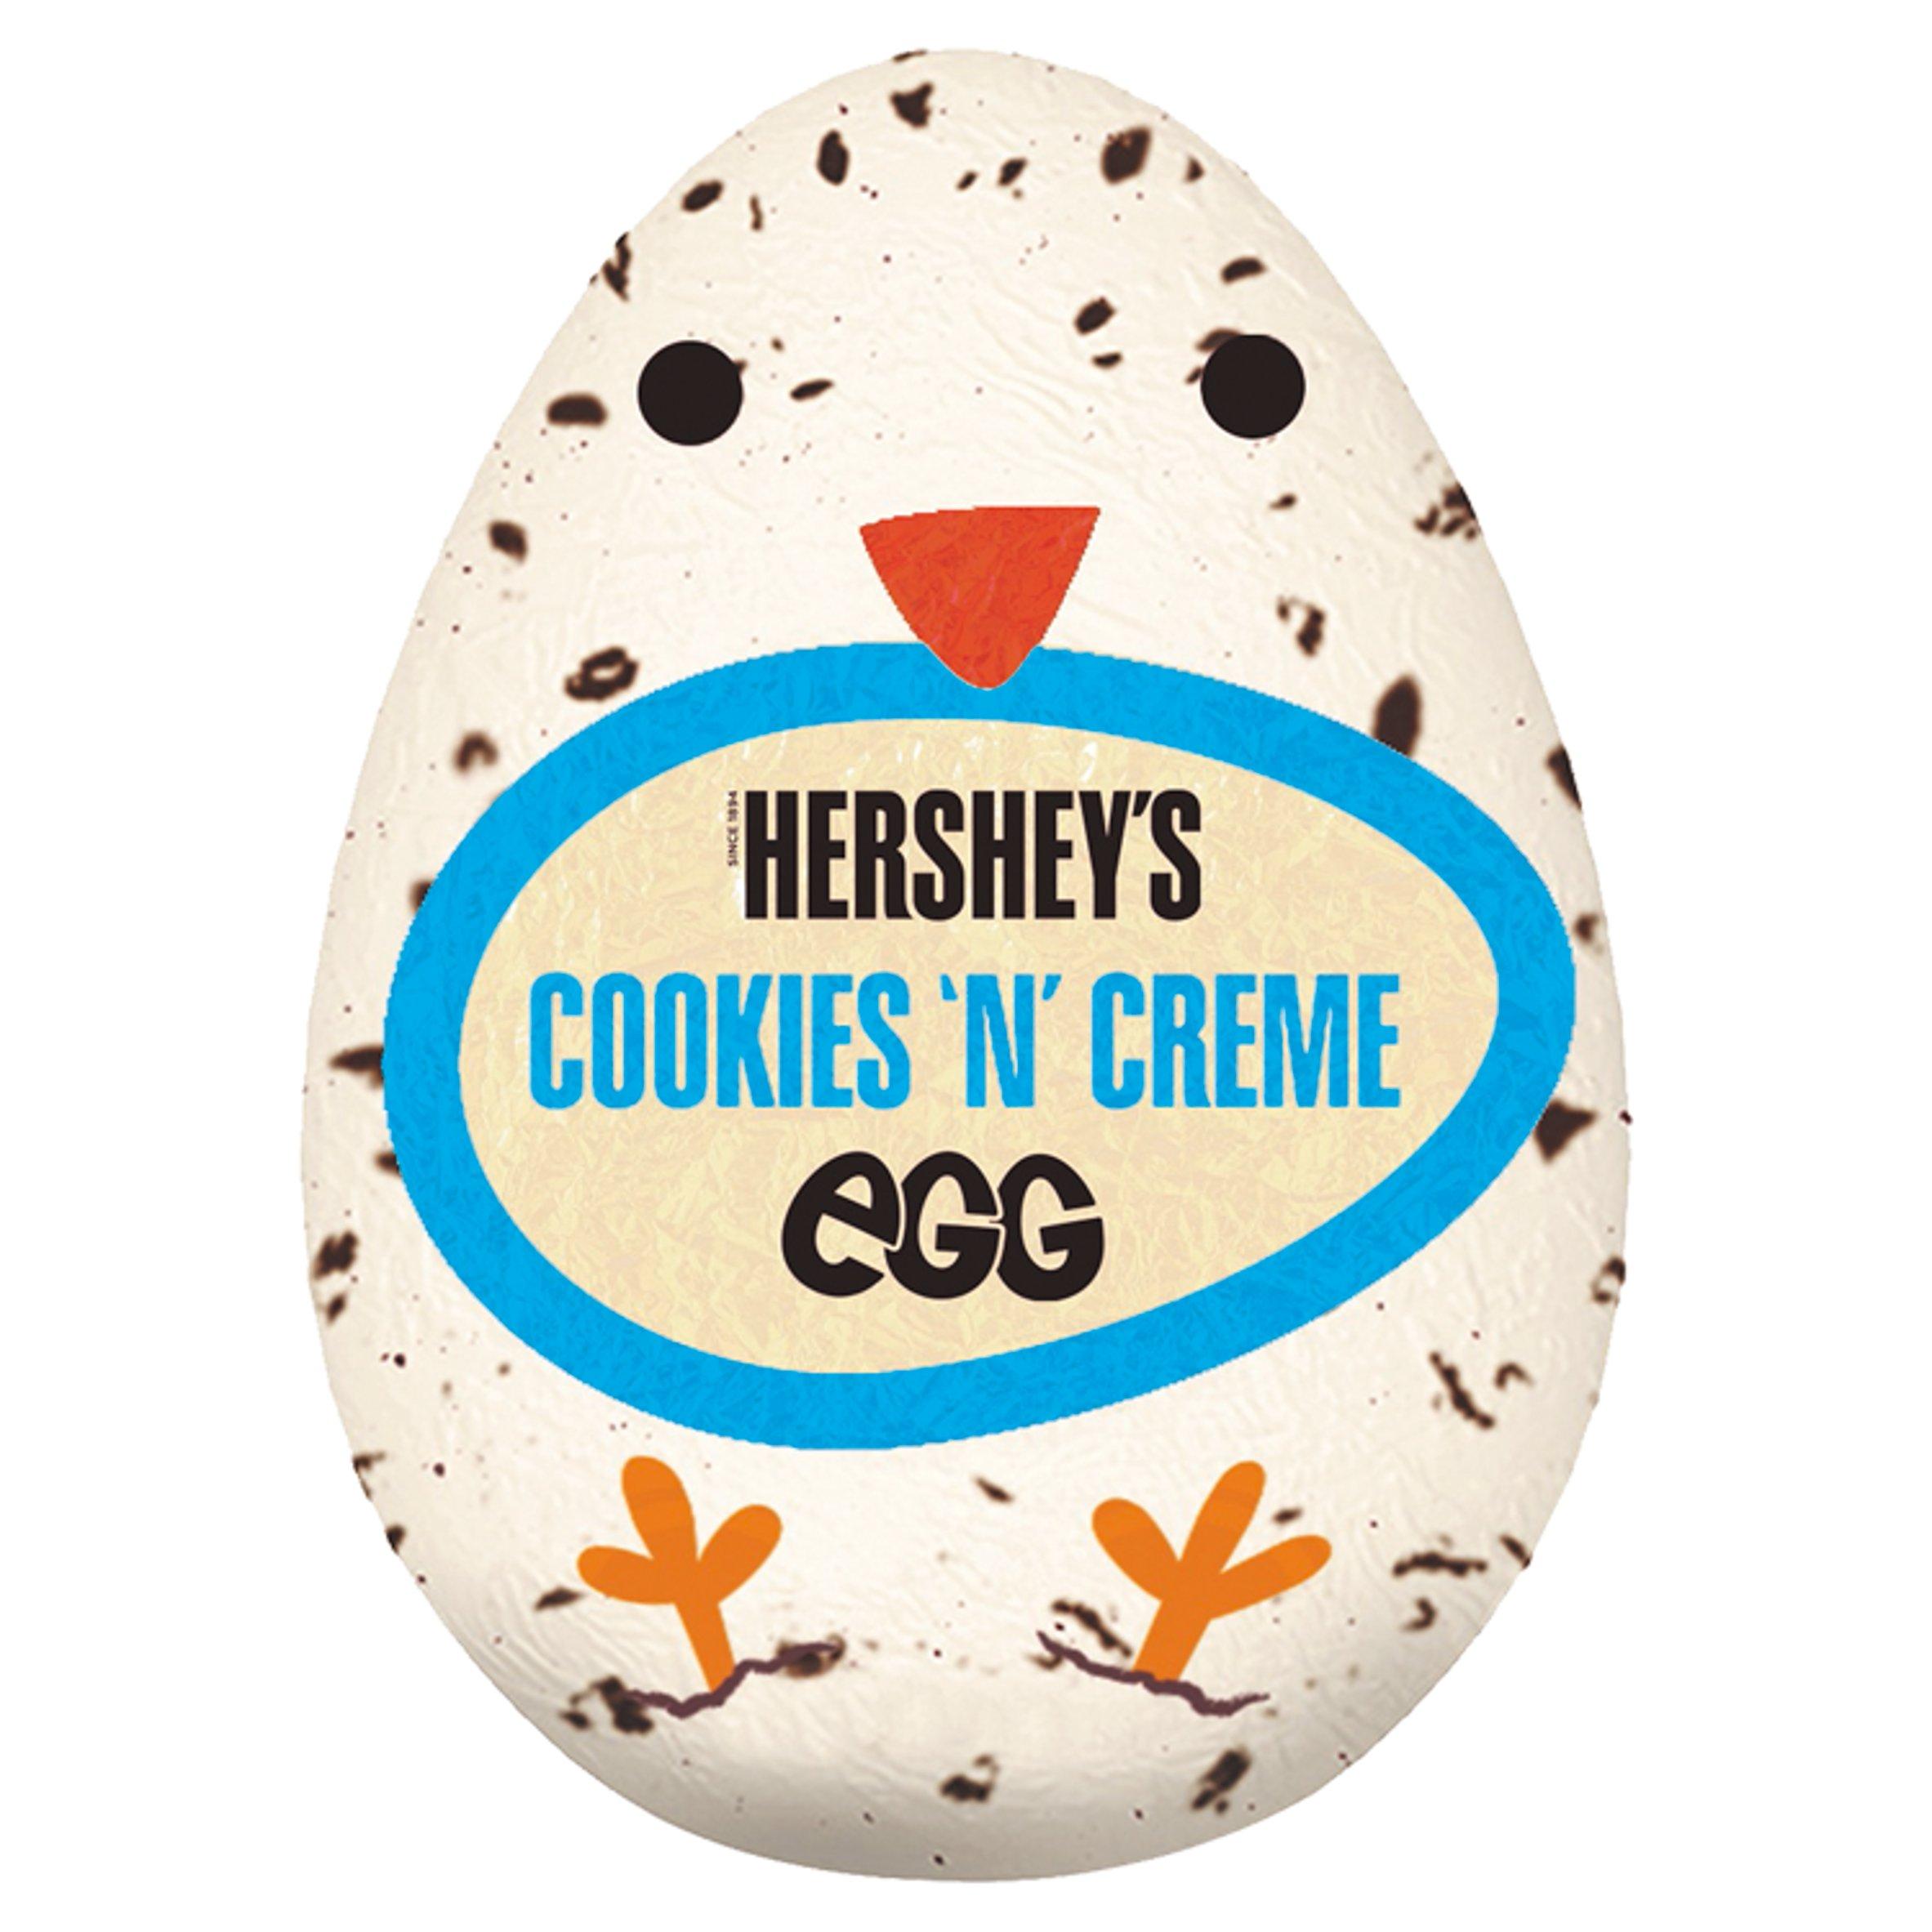 Hershey's Cookies & Creme Egg 34G